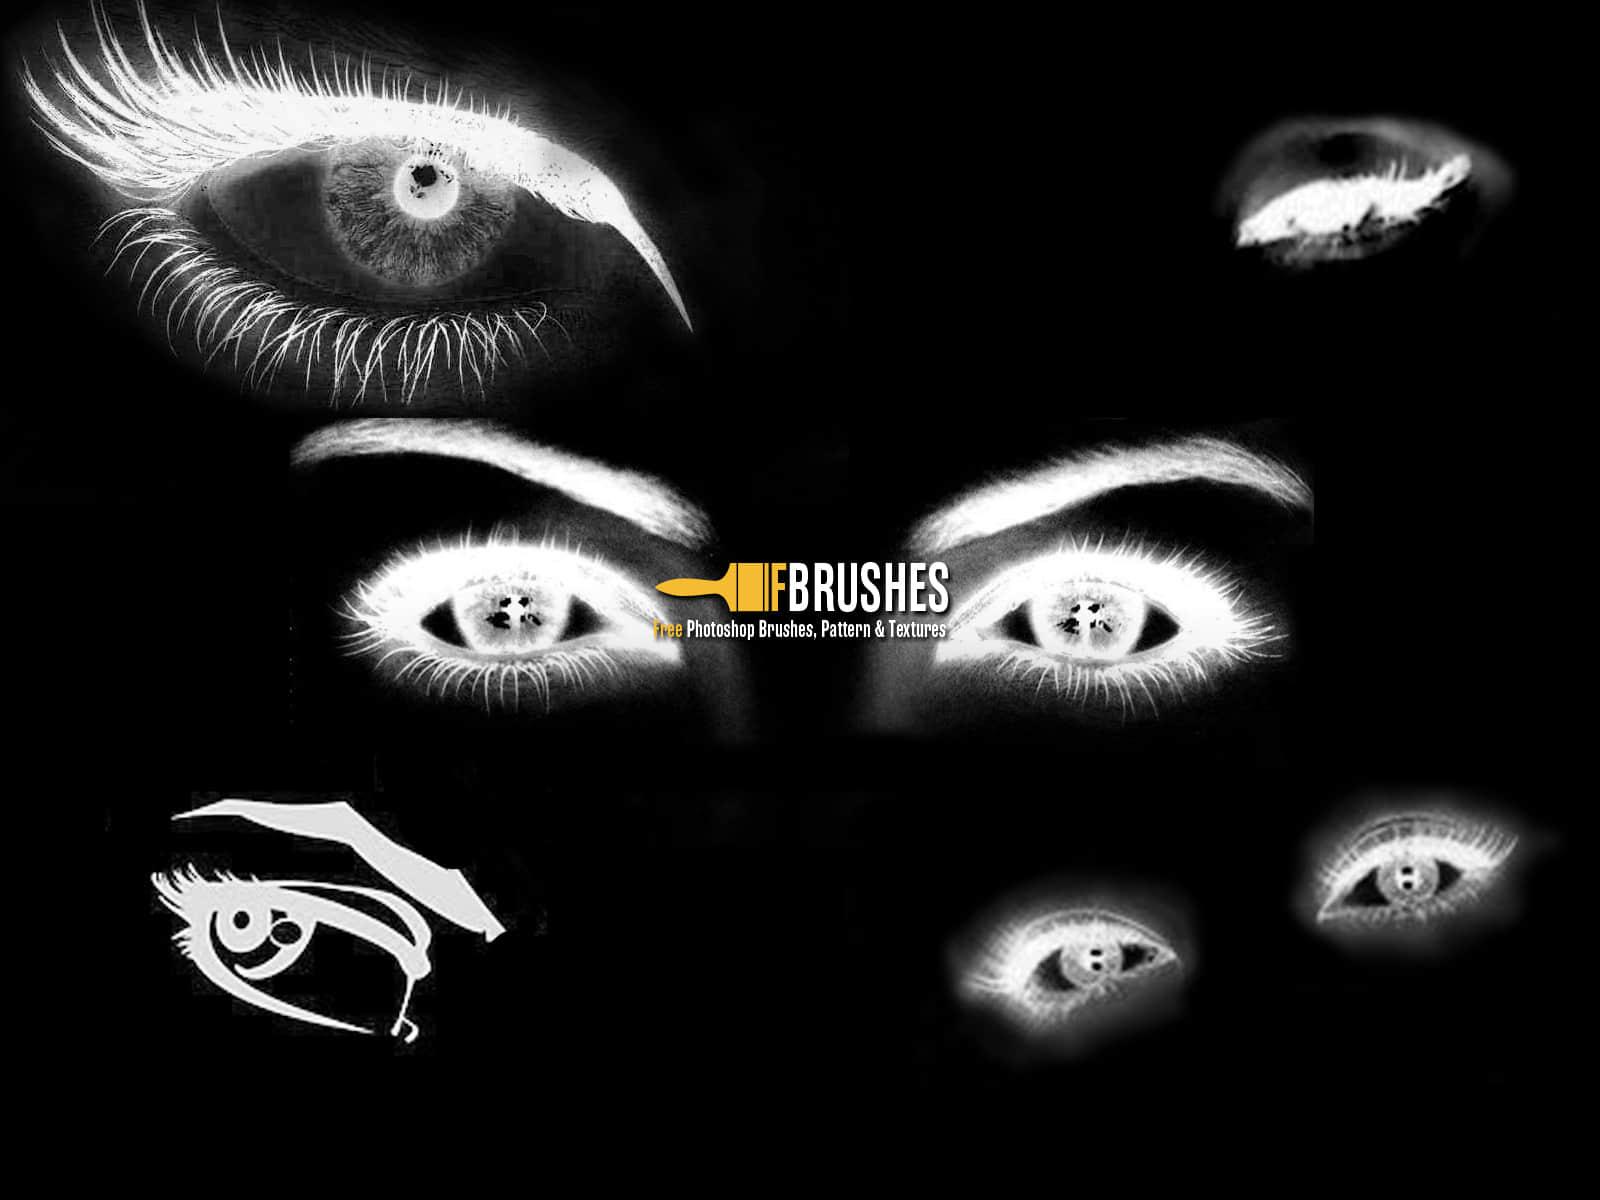 犀利眼神、眼睛Photoshop笔刷素材下载 眼神笔刷 眼睛笔刷  characters brushes